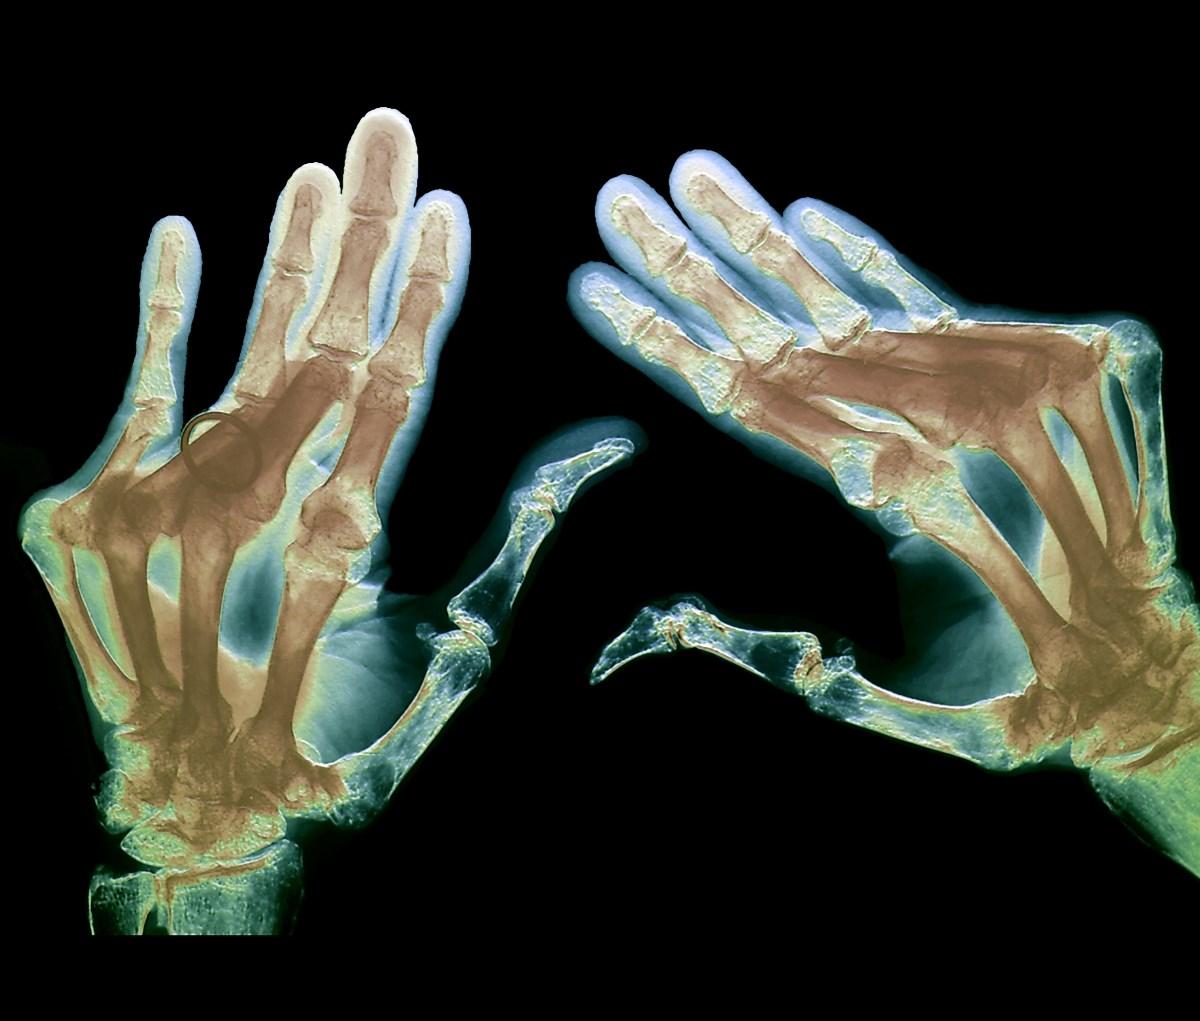 Glucocorticoids for Early Rheumatoid Arthritis Demonstrate Good Long-term Safety